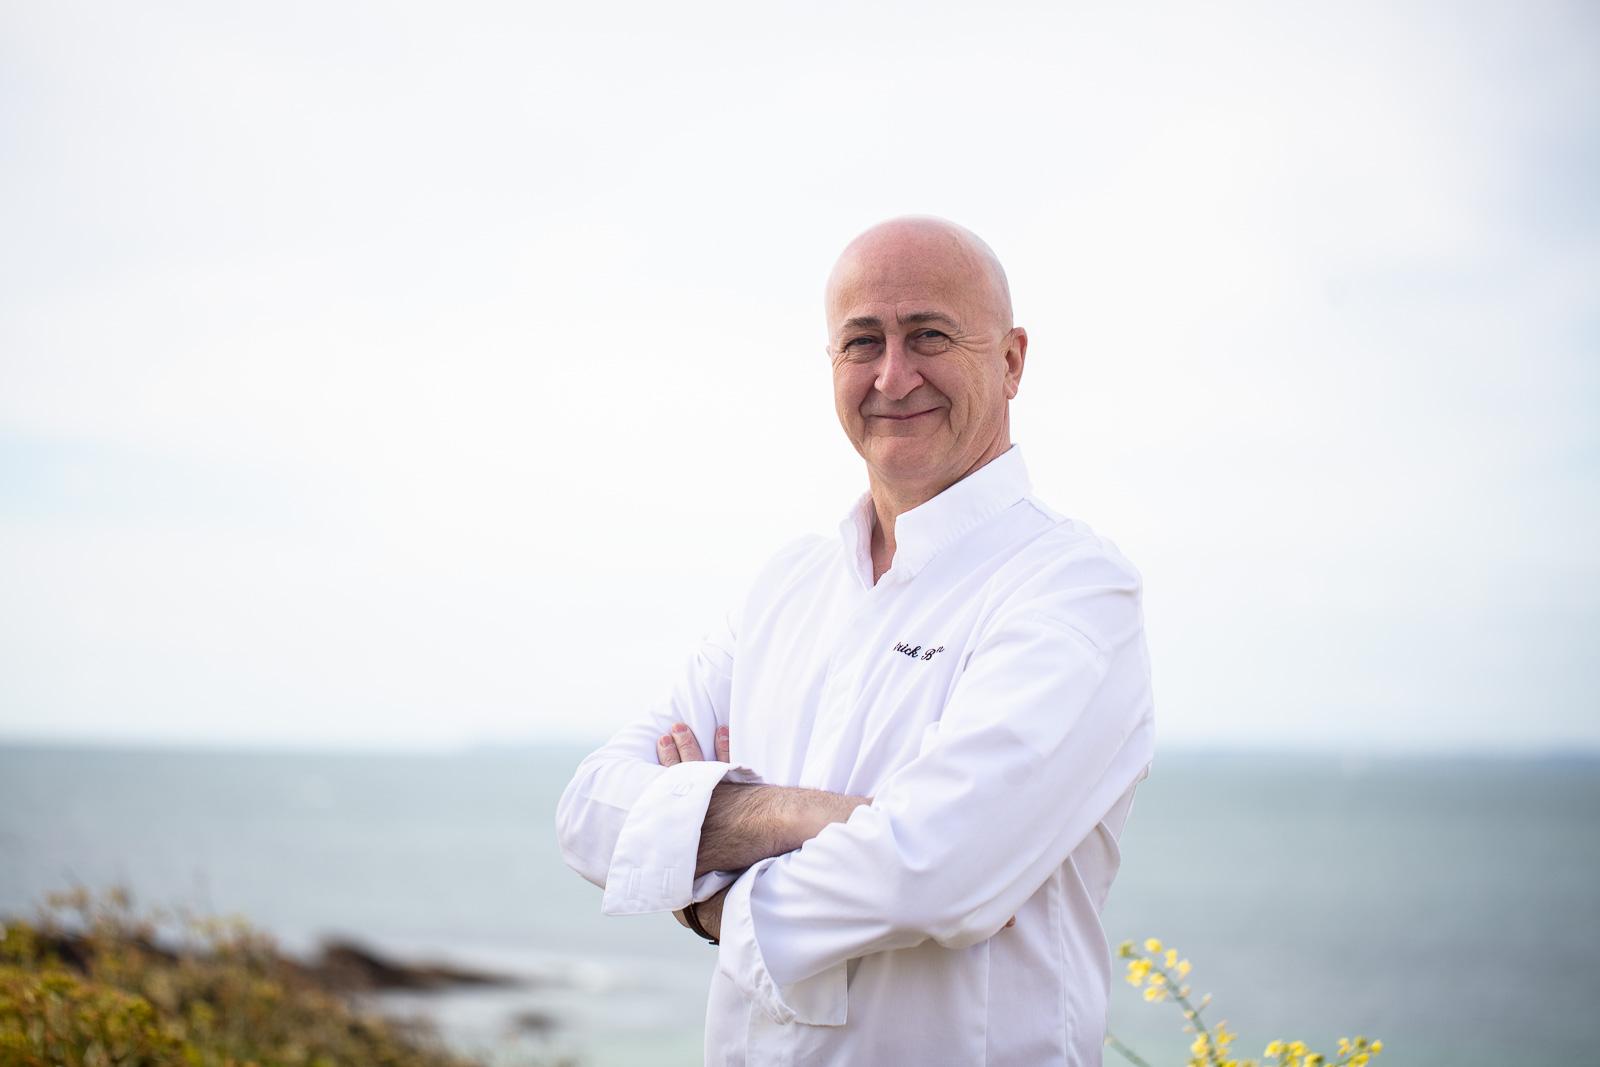 Franck_Hamel_Sofitel_Quiberon_valerie_paumelle_agent-photographe_culinaire-foodphotographer (2).jpg